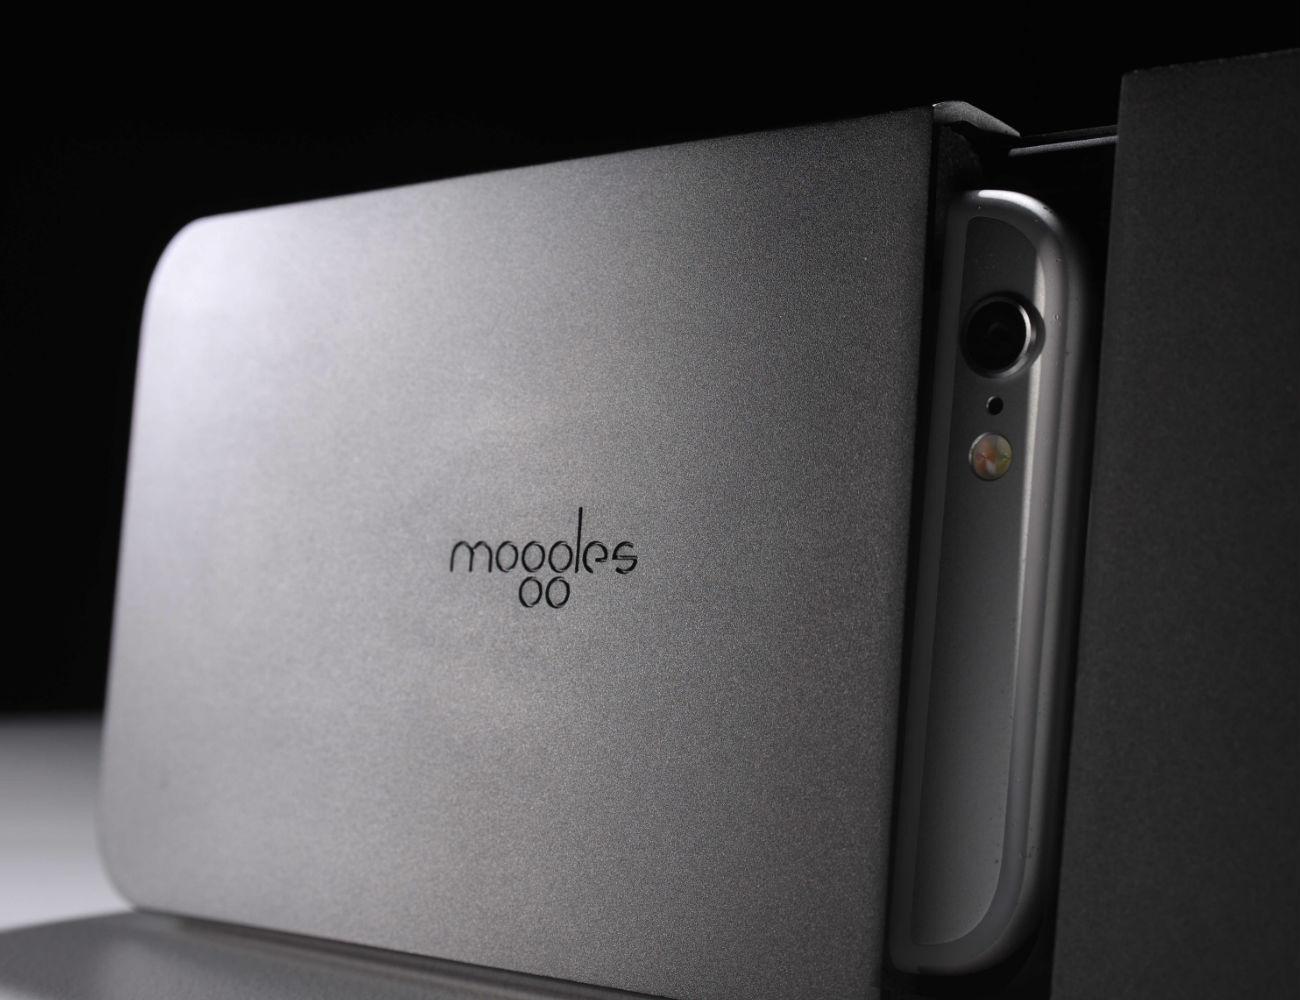 Moggles Pocket Virtual Reality